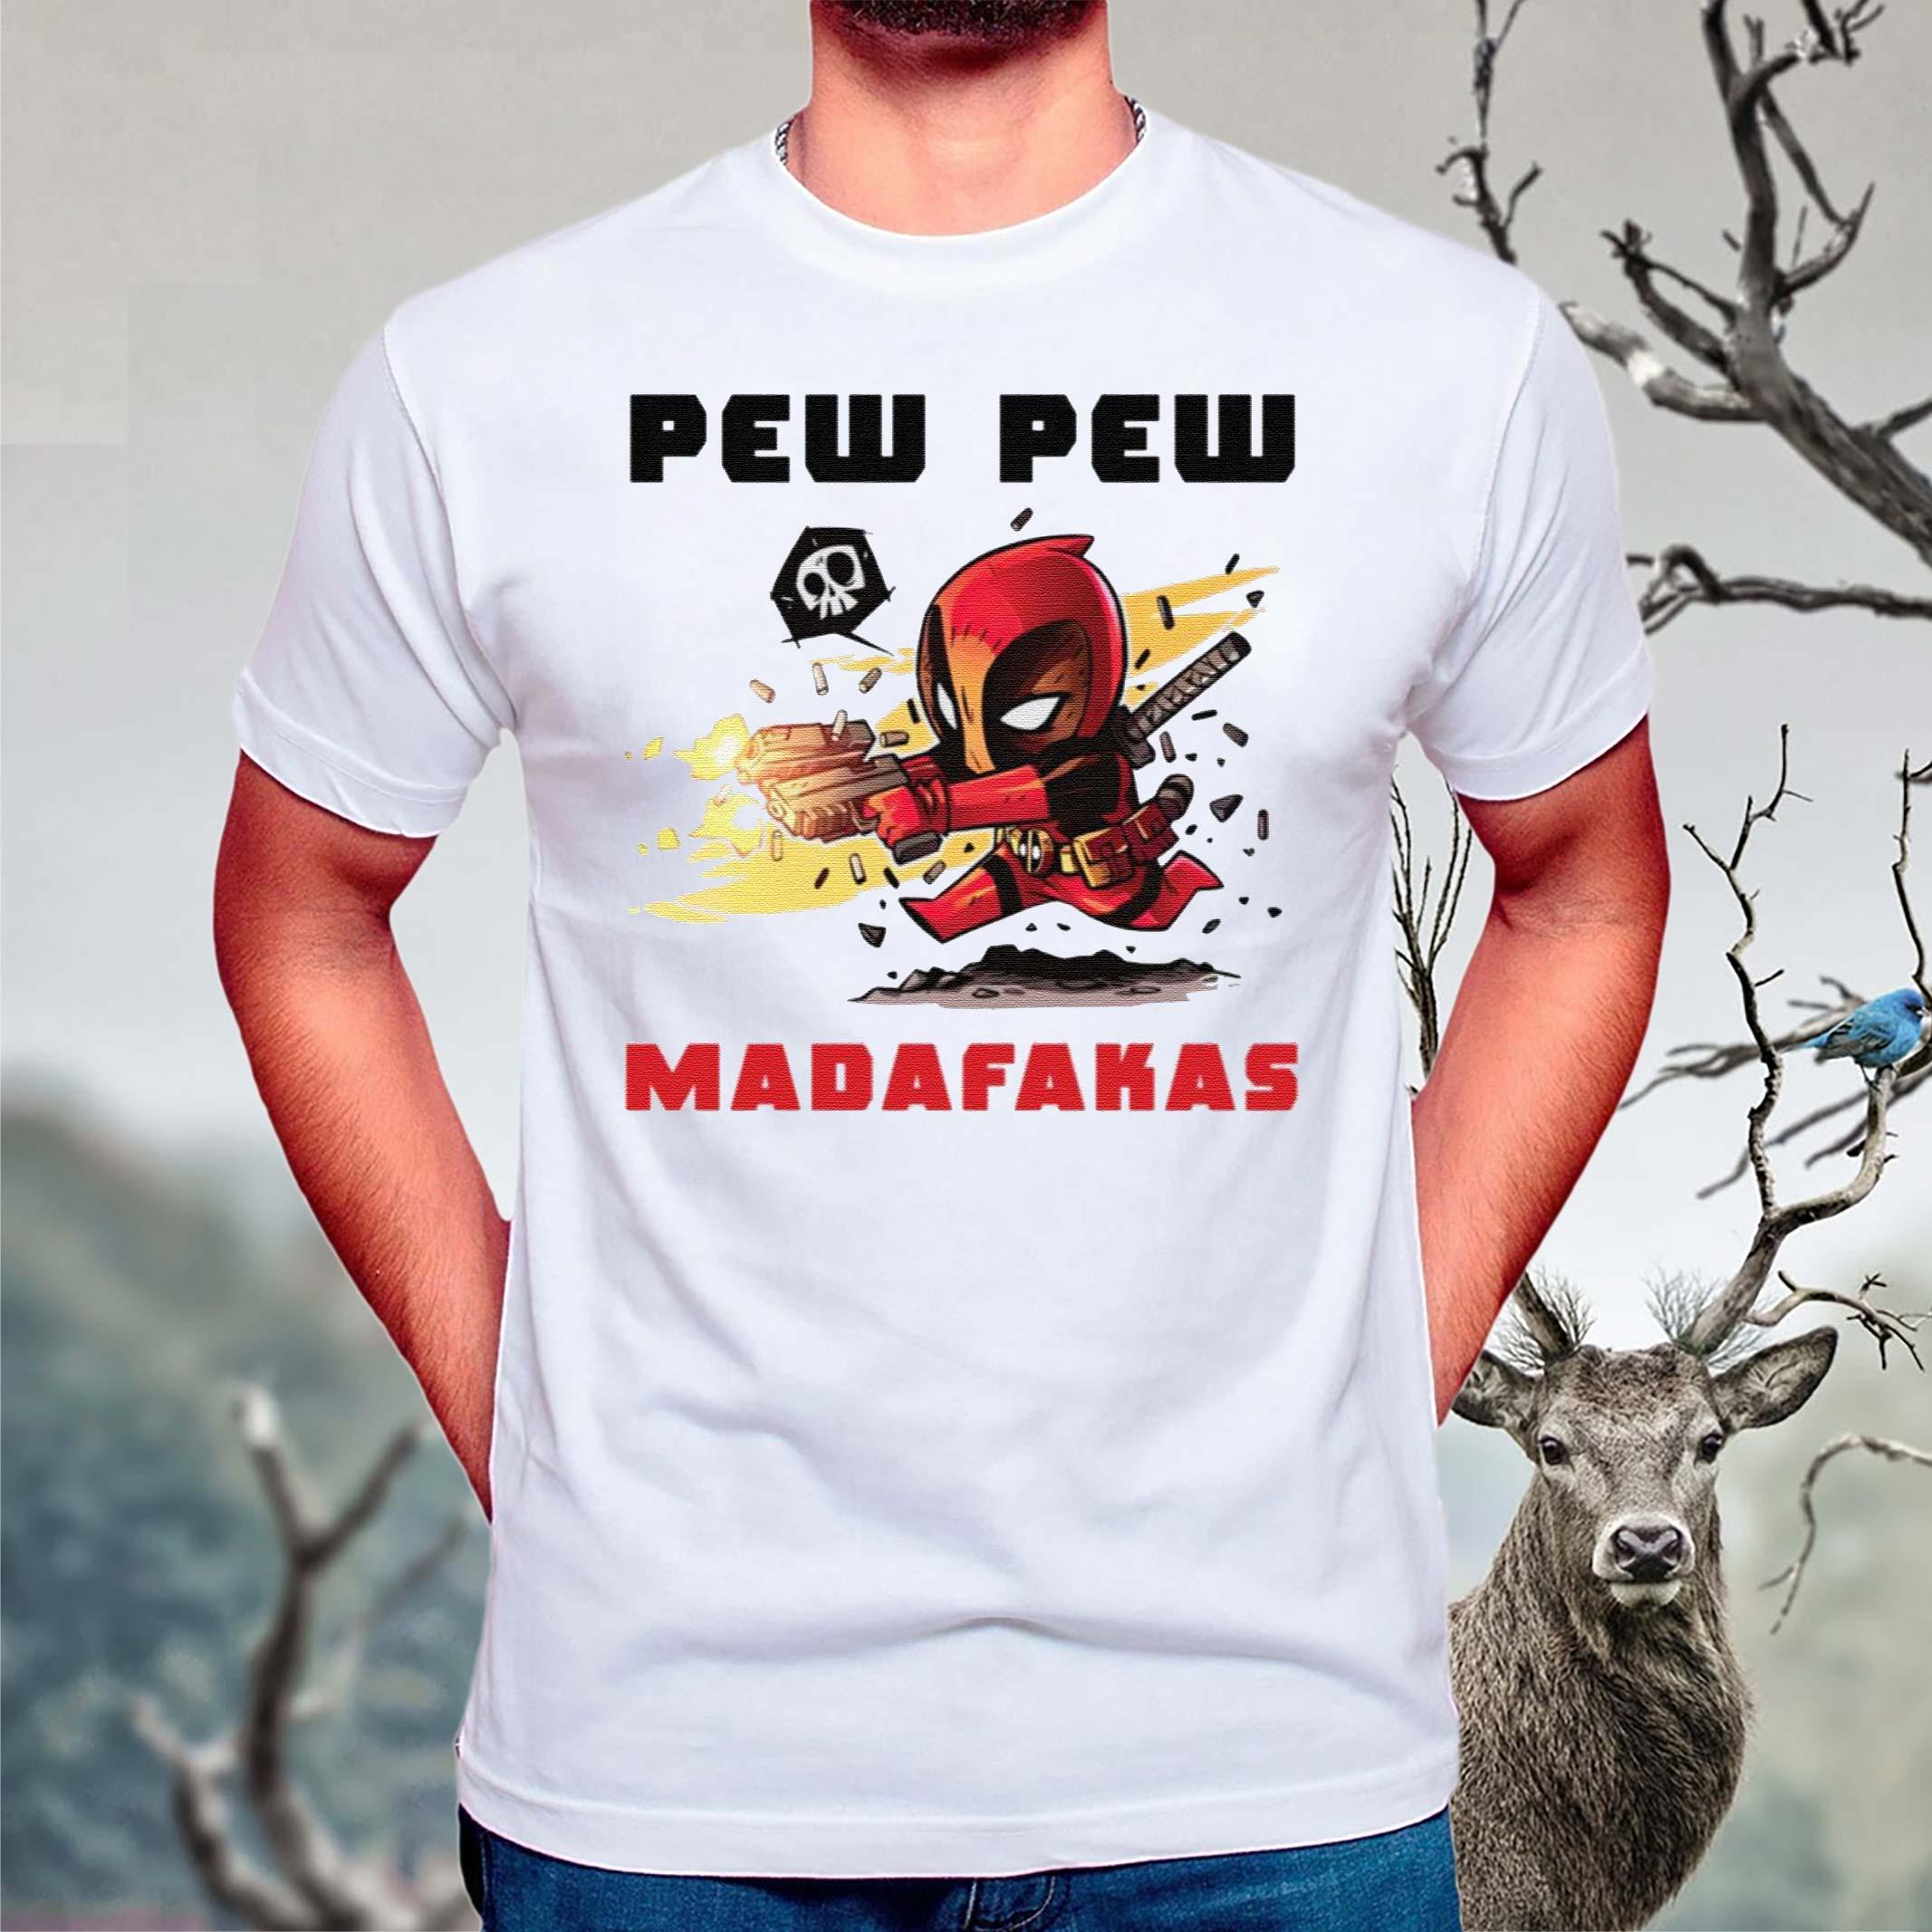 Deadpool-Pew-Pew-Madafakas-shirt